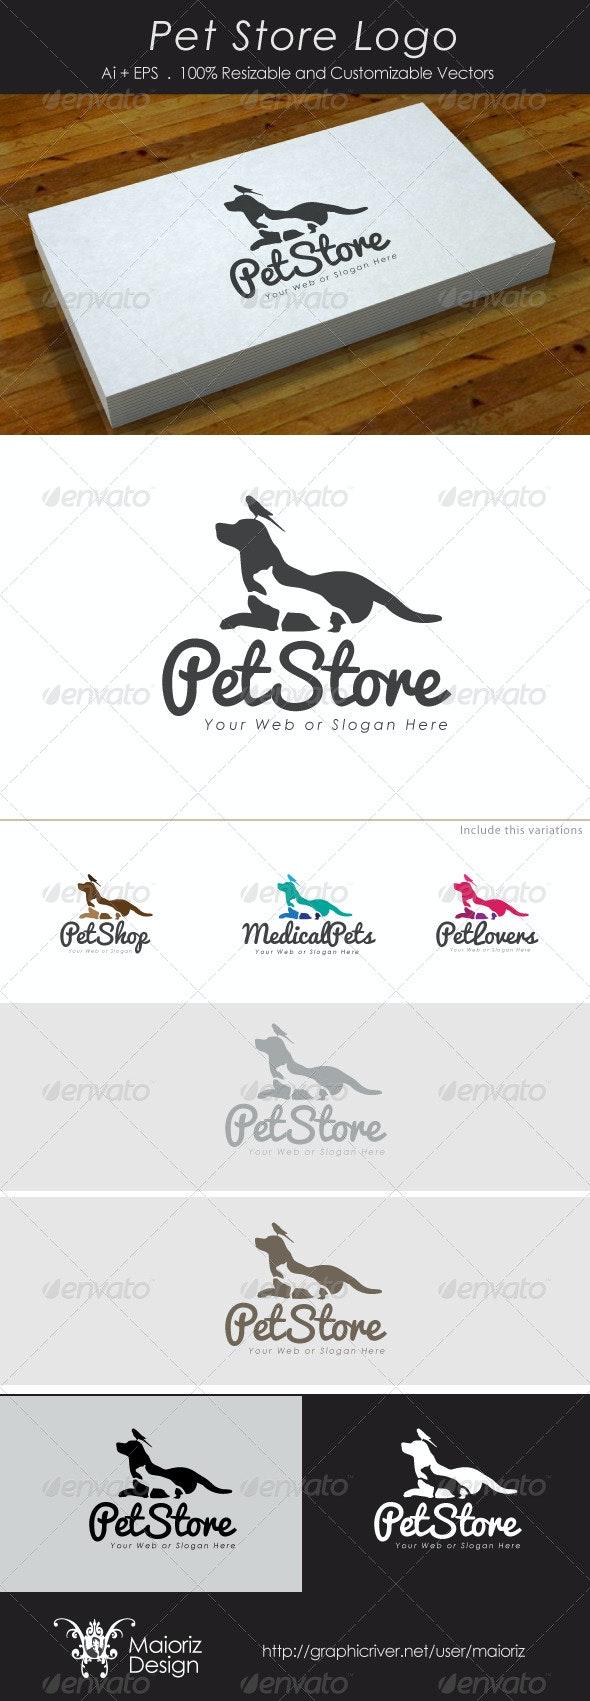 Pet Store Logo - Animals Logo Templates